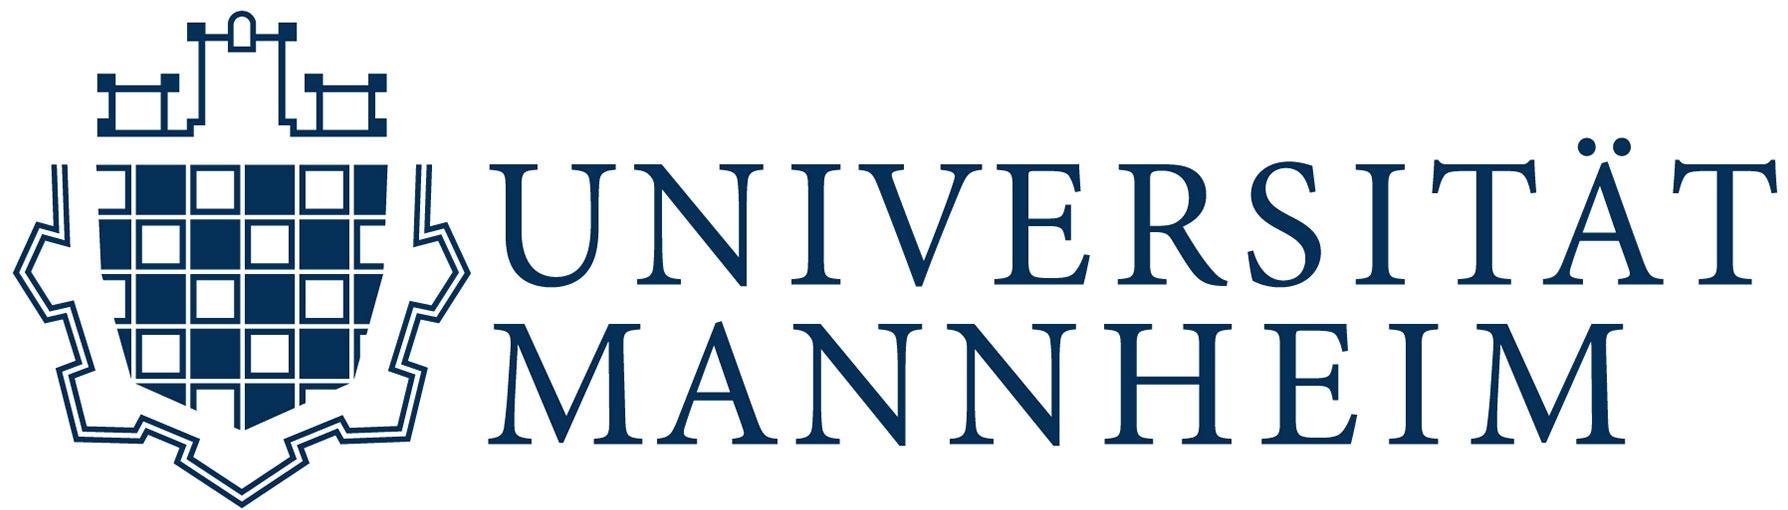 Universität Mannheim (UMA) - Logo